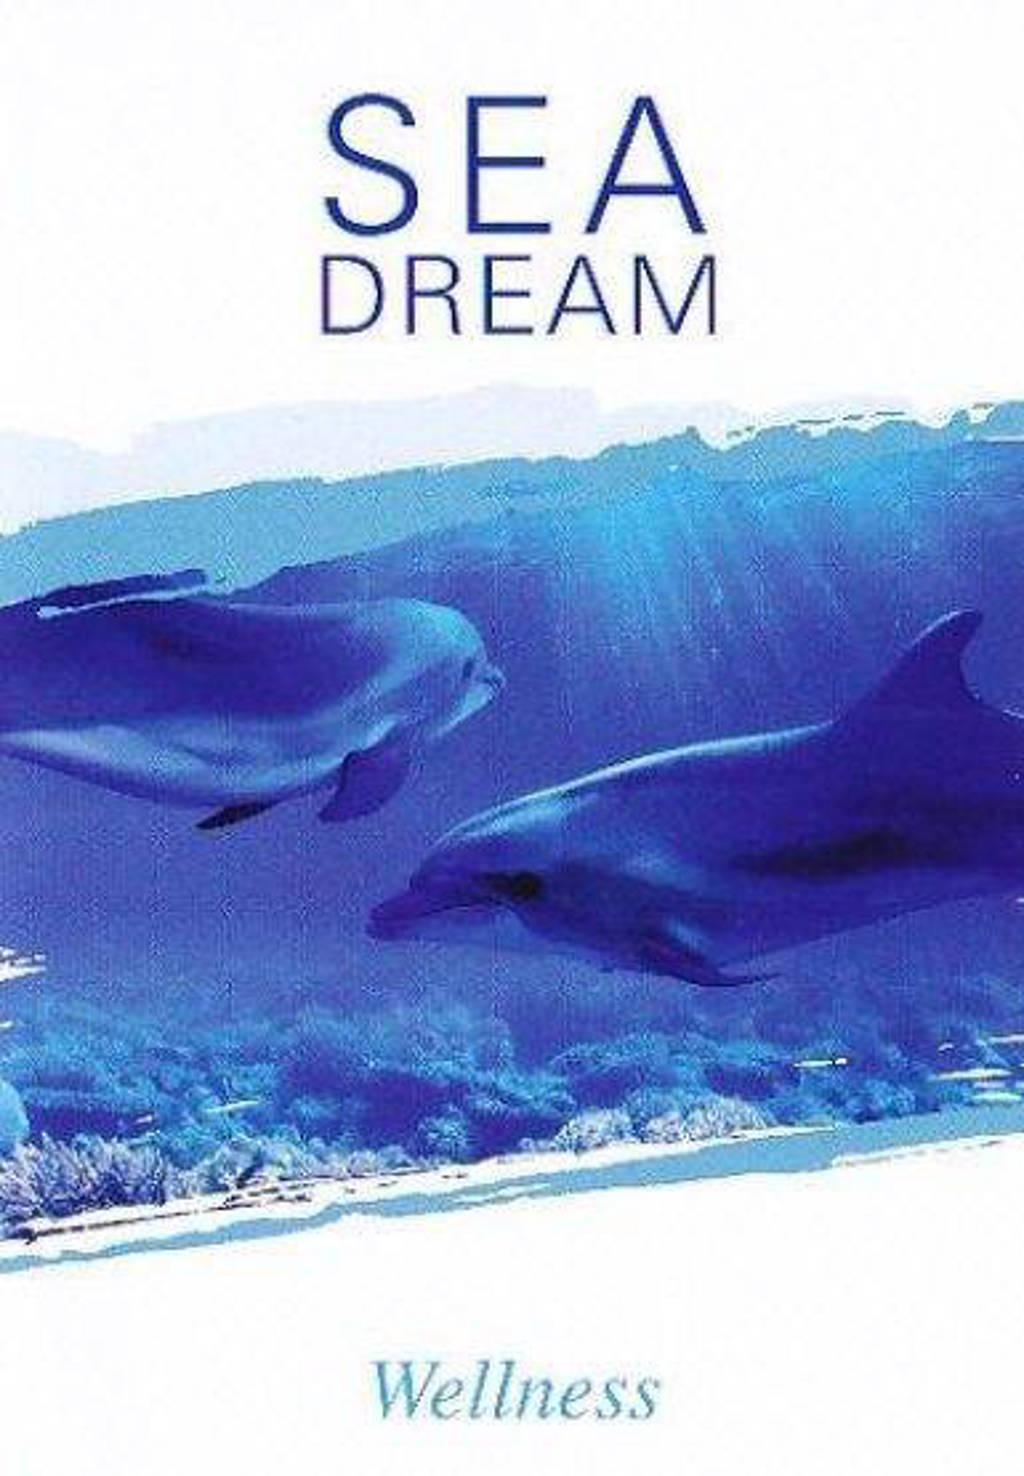 Welness - Sea dream (DVD)